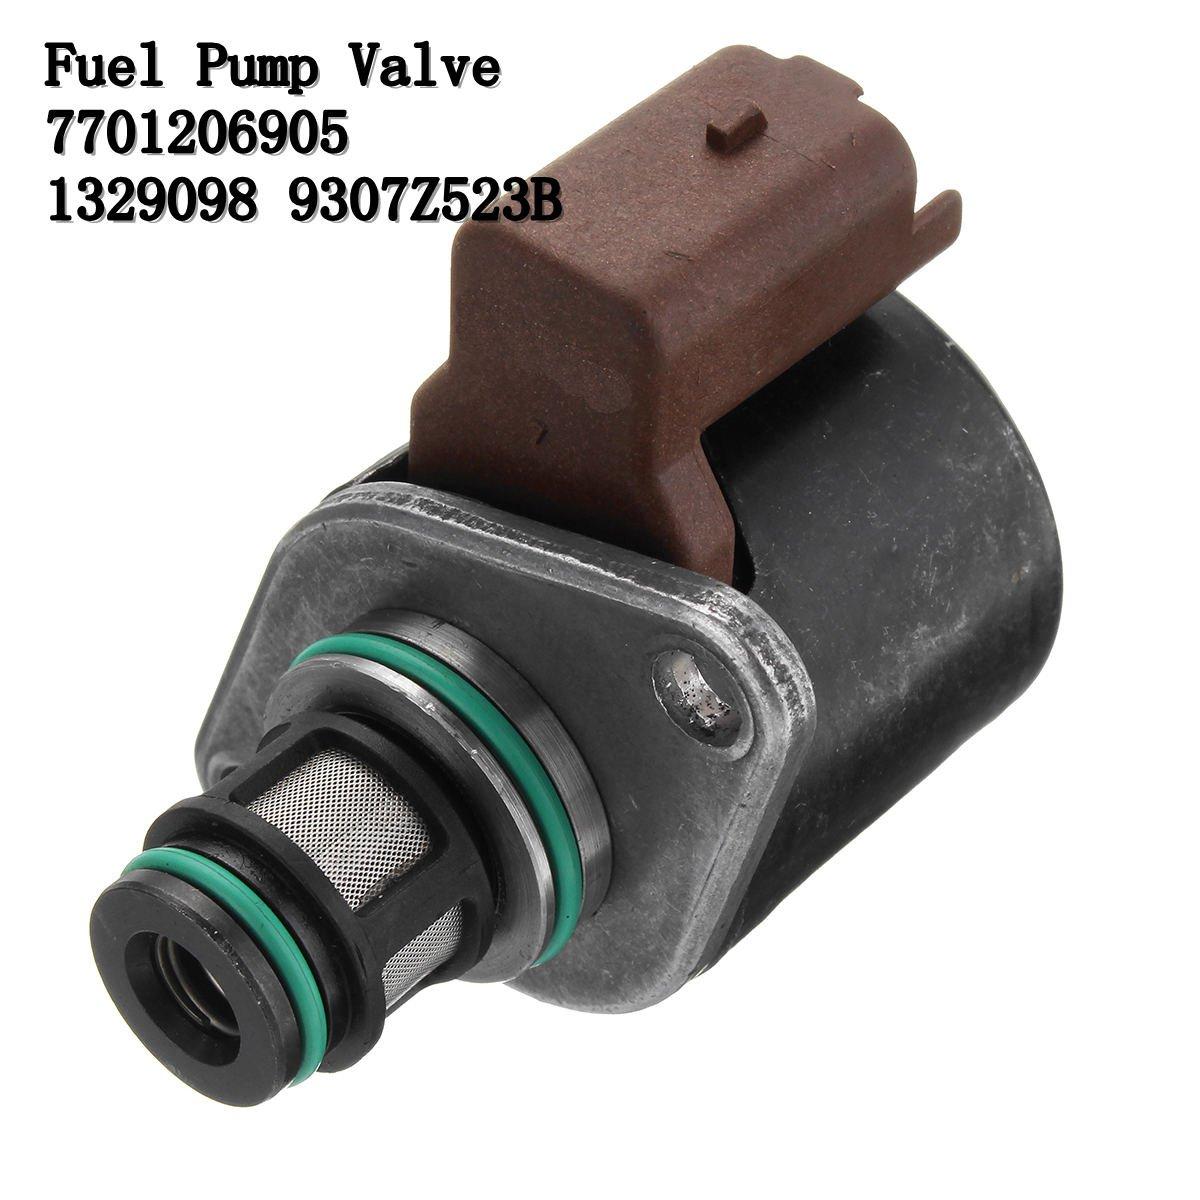 medium resolution of detail feedback questions about 7701206905 fuel pump inlet metering valve imv pressure regulator sensor for ford for citroen on aliexpress com alibaba